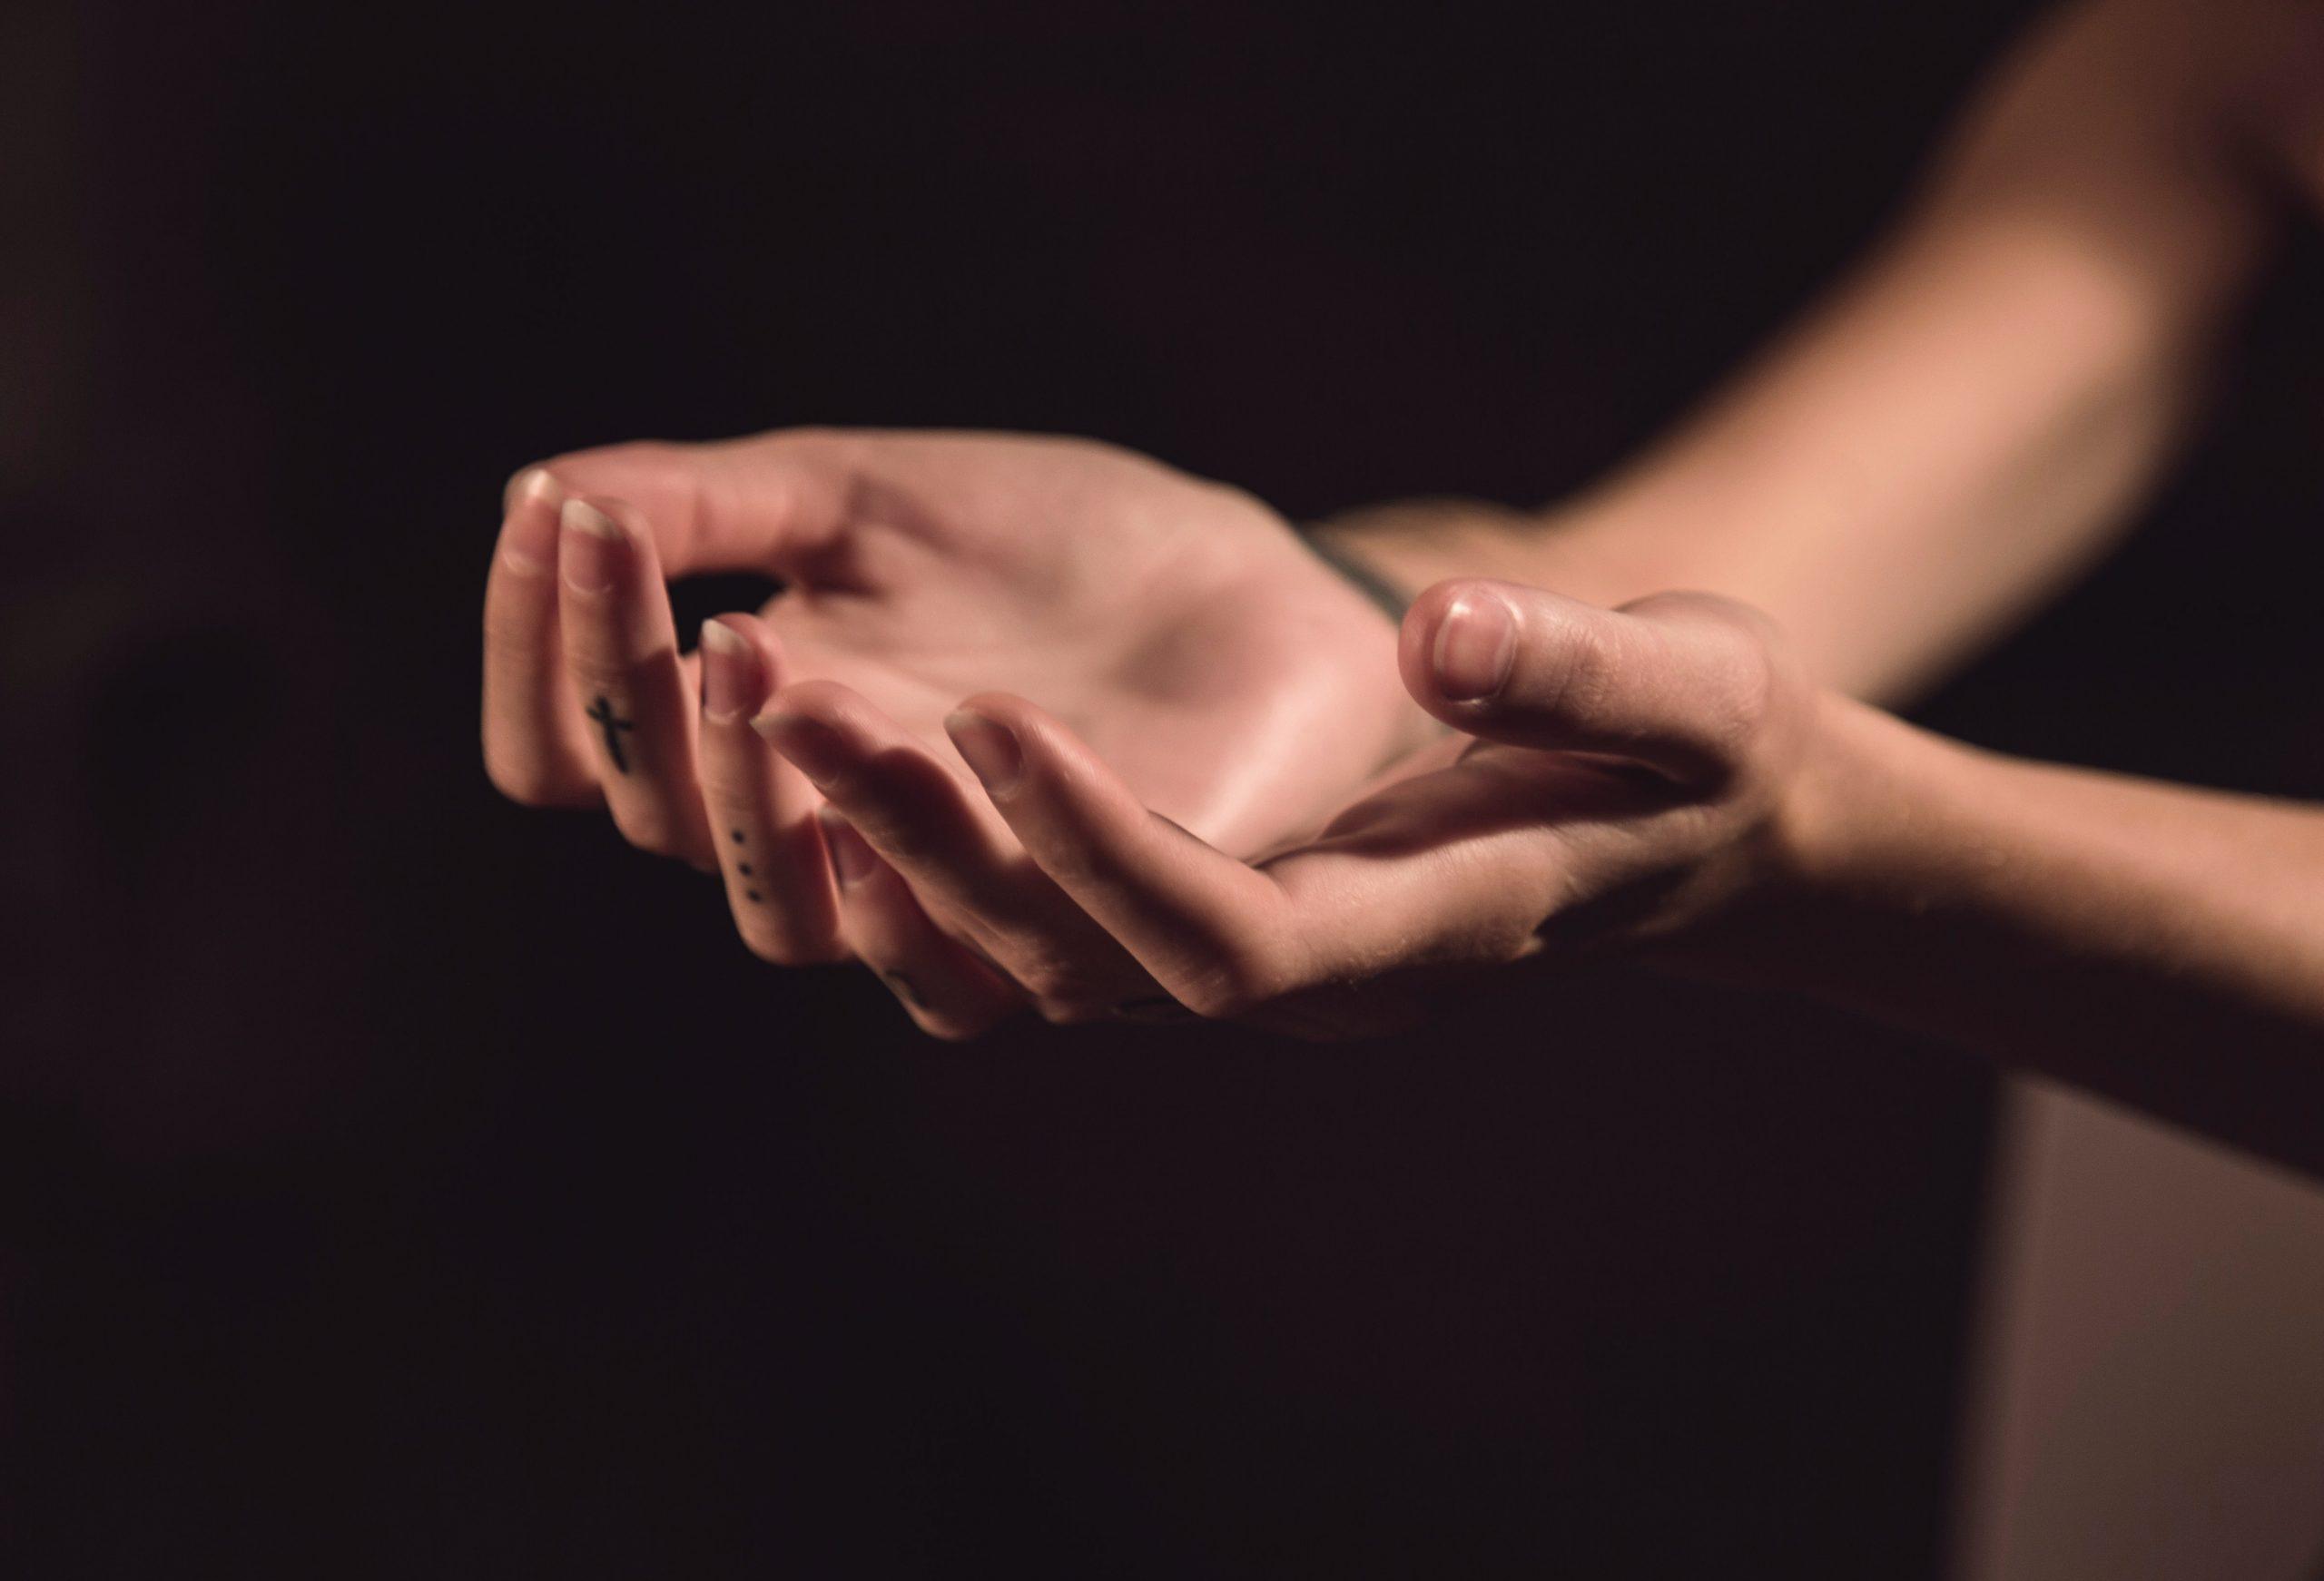 Extravagant Worship: Jesus is Anointed